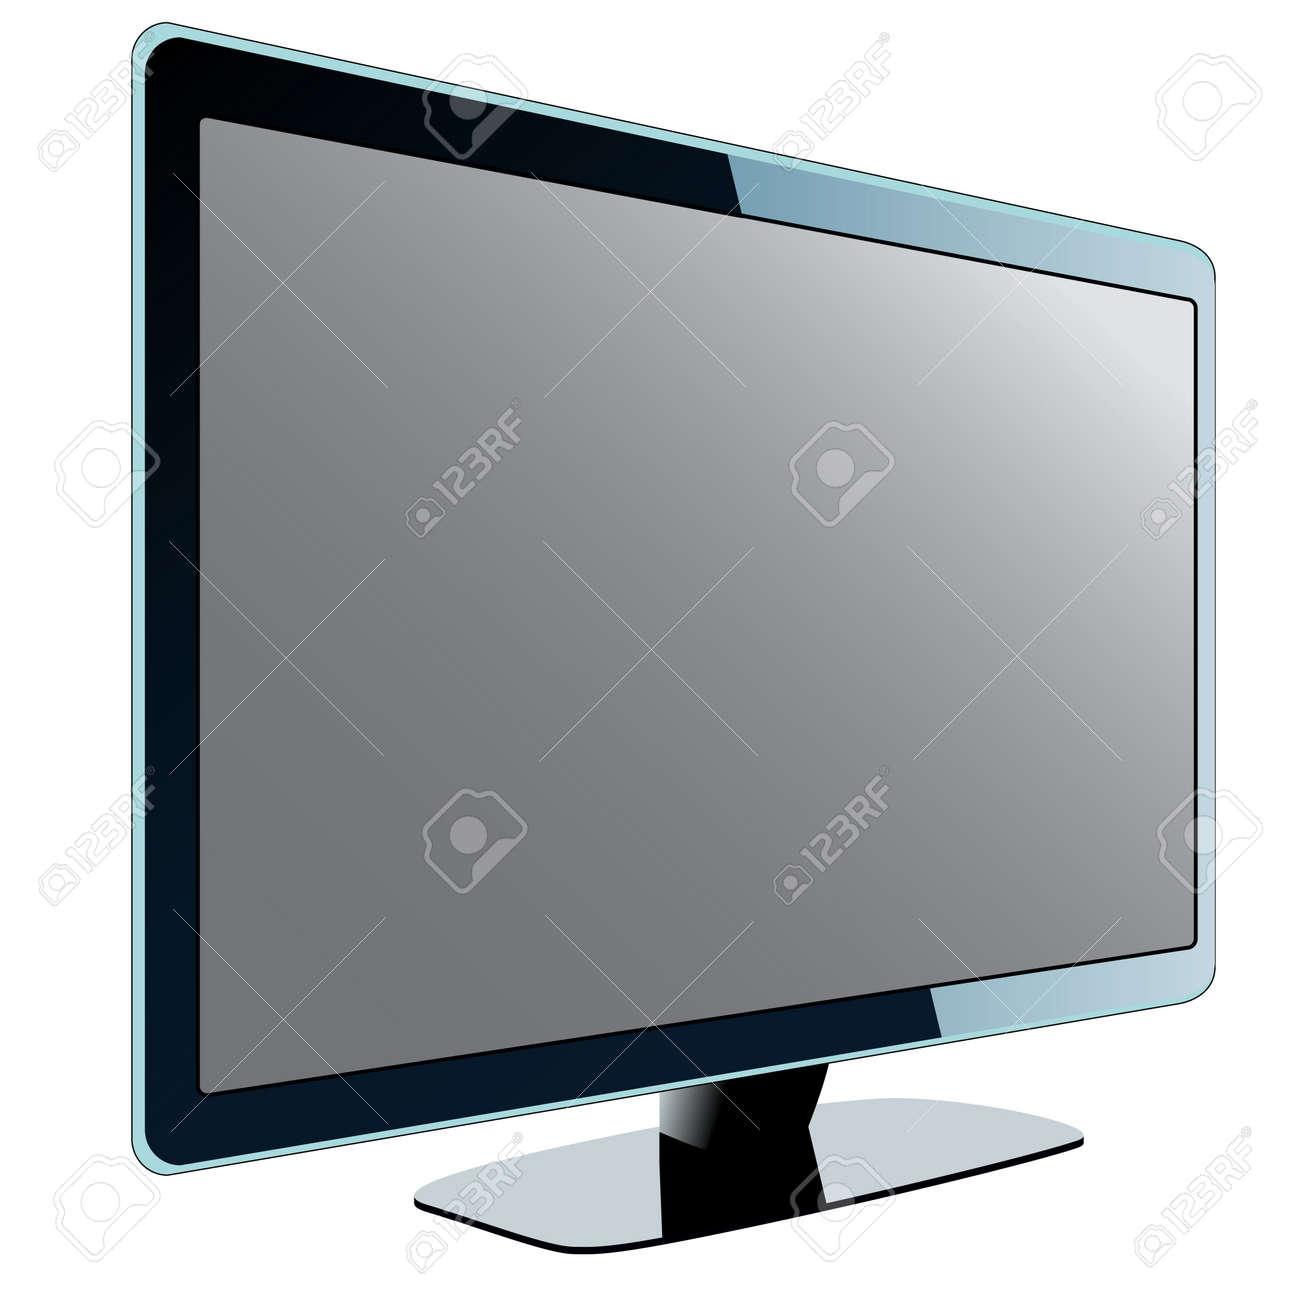 TV - 6747695